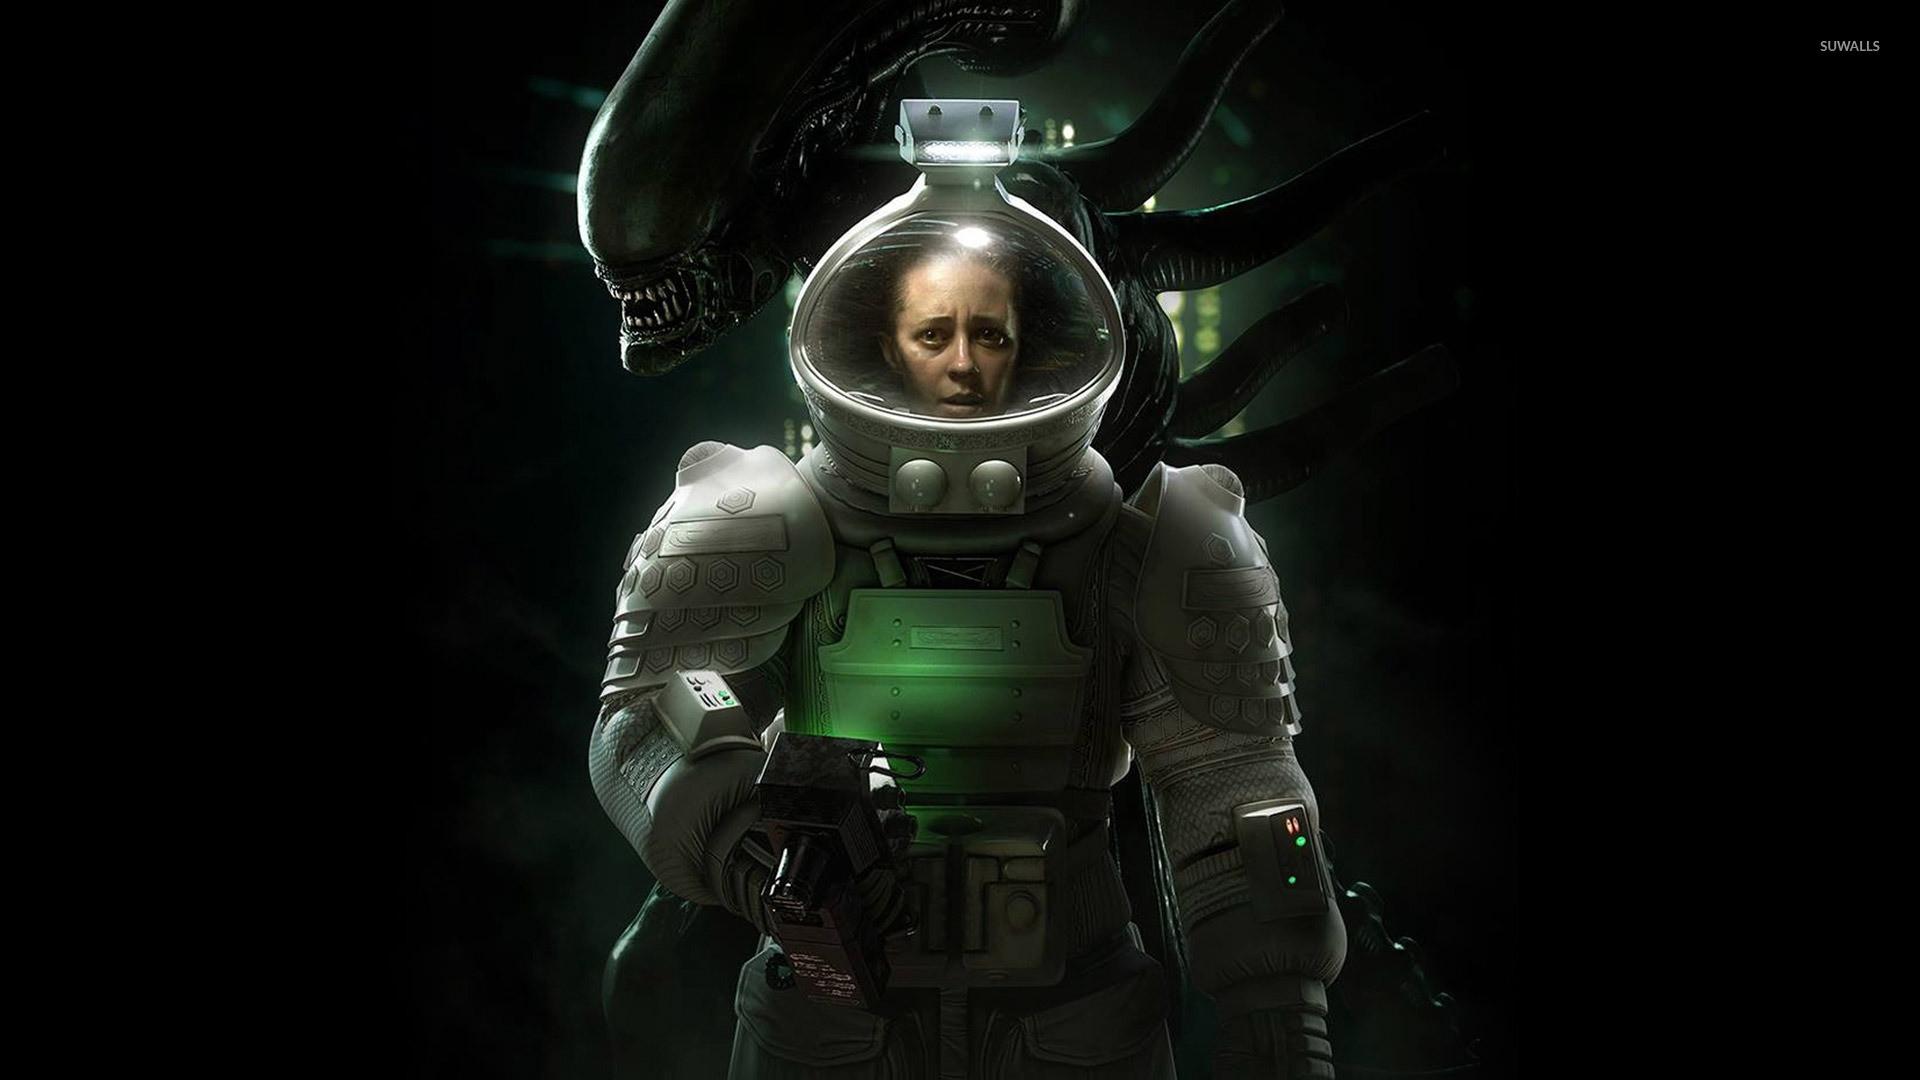 Alien: Isolation [4] wallpaper jpg